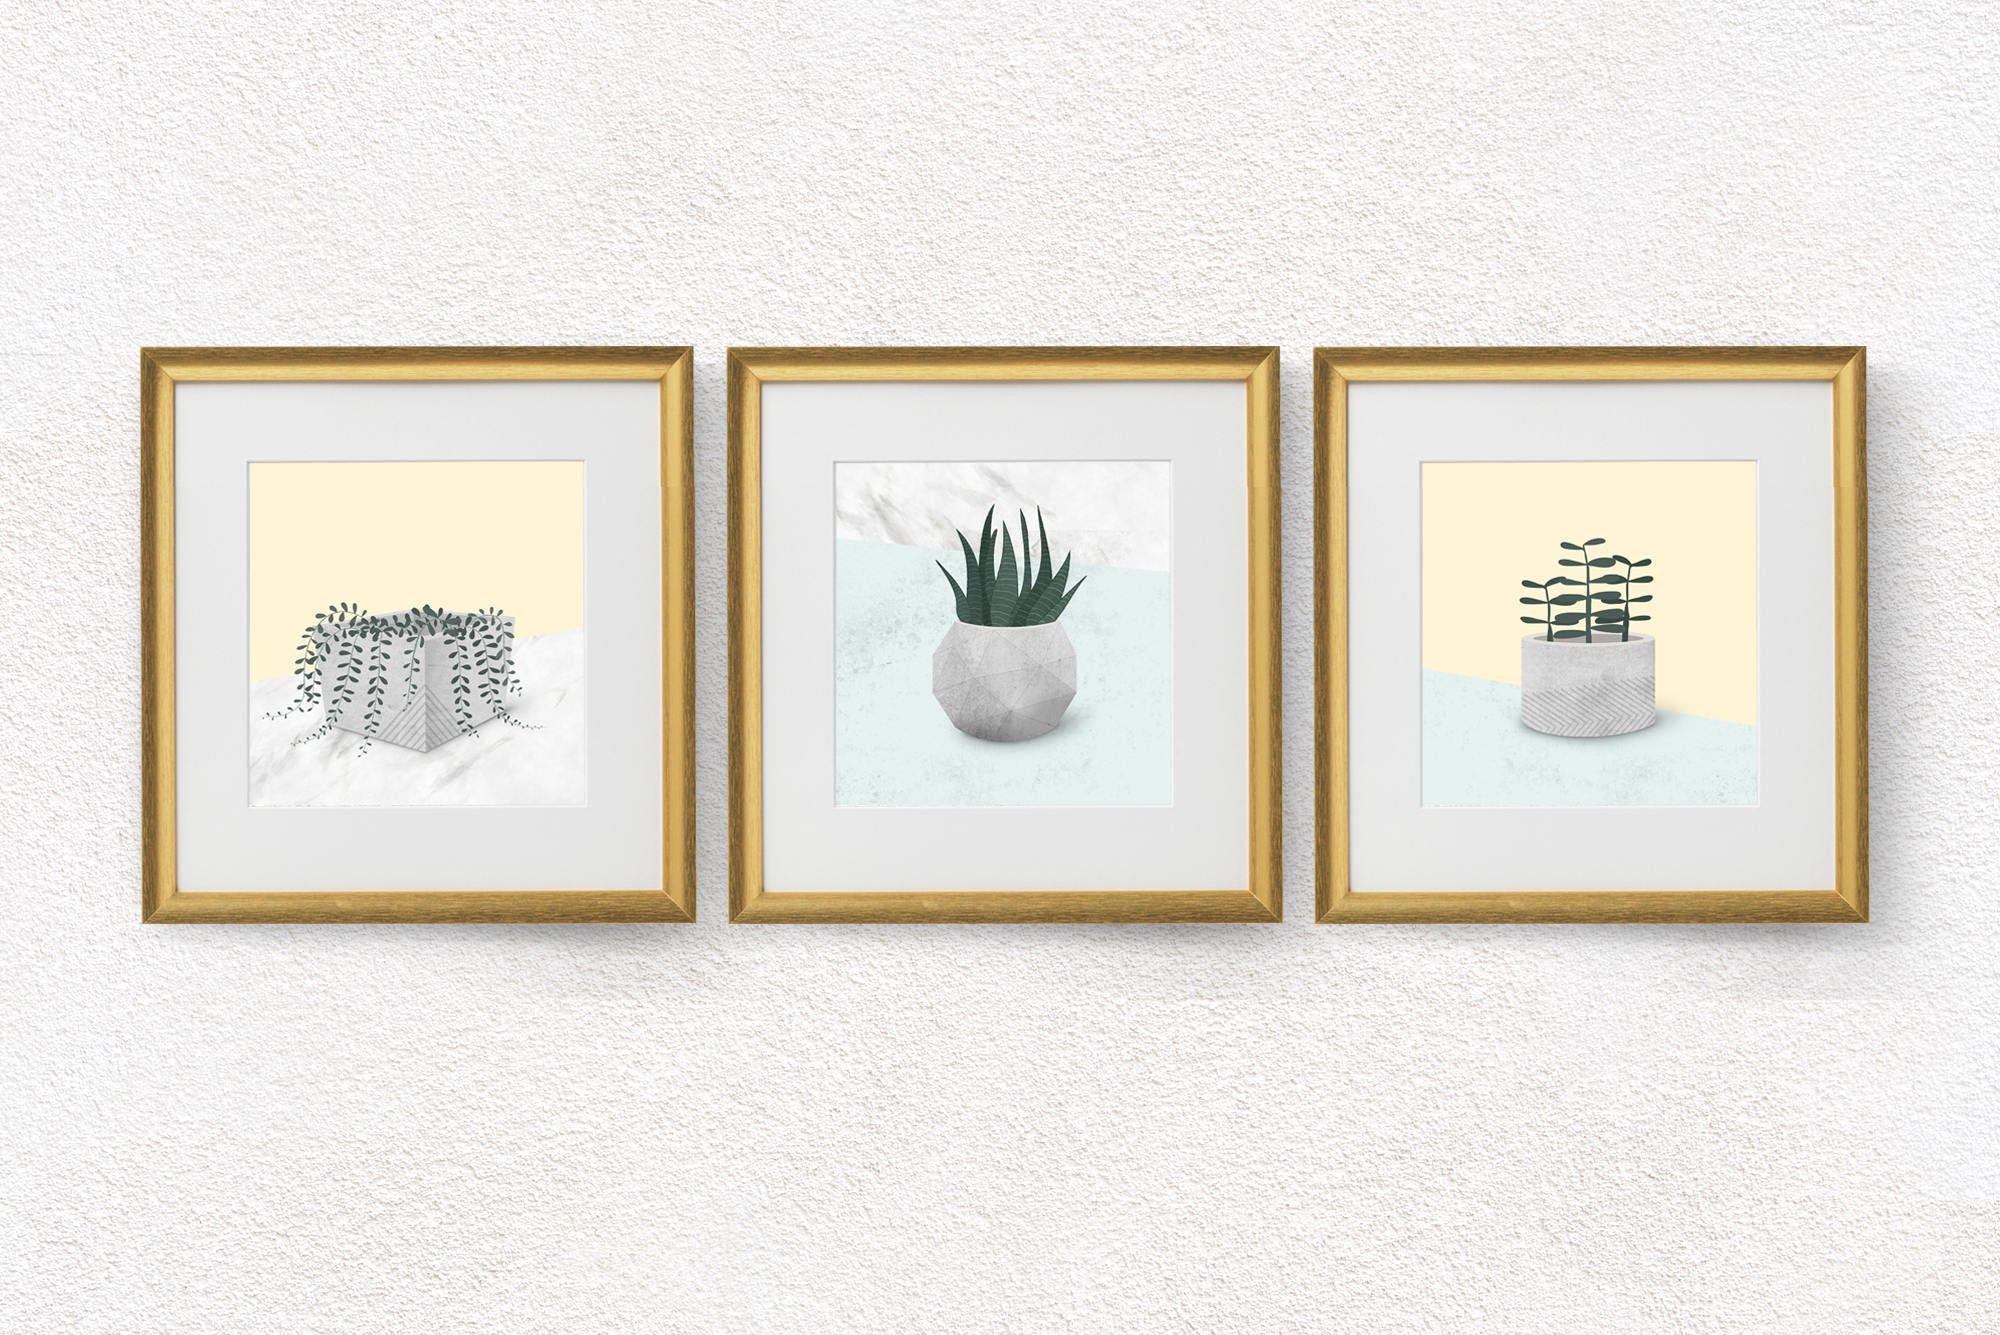 Modern Living Room Wall Decor Set : Living room wall art decor modern set